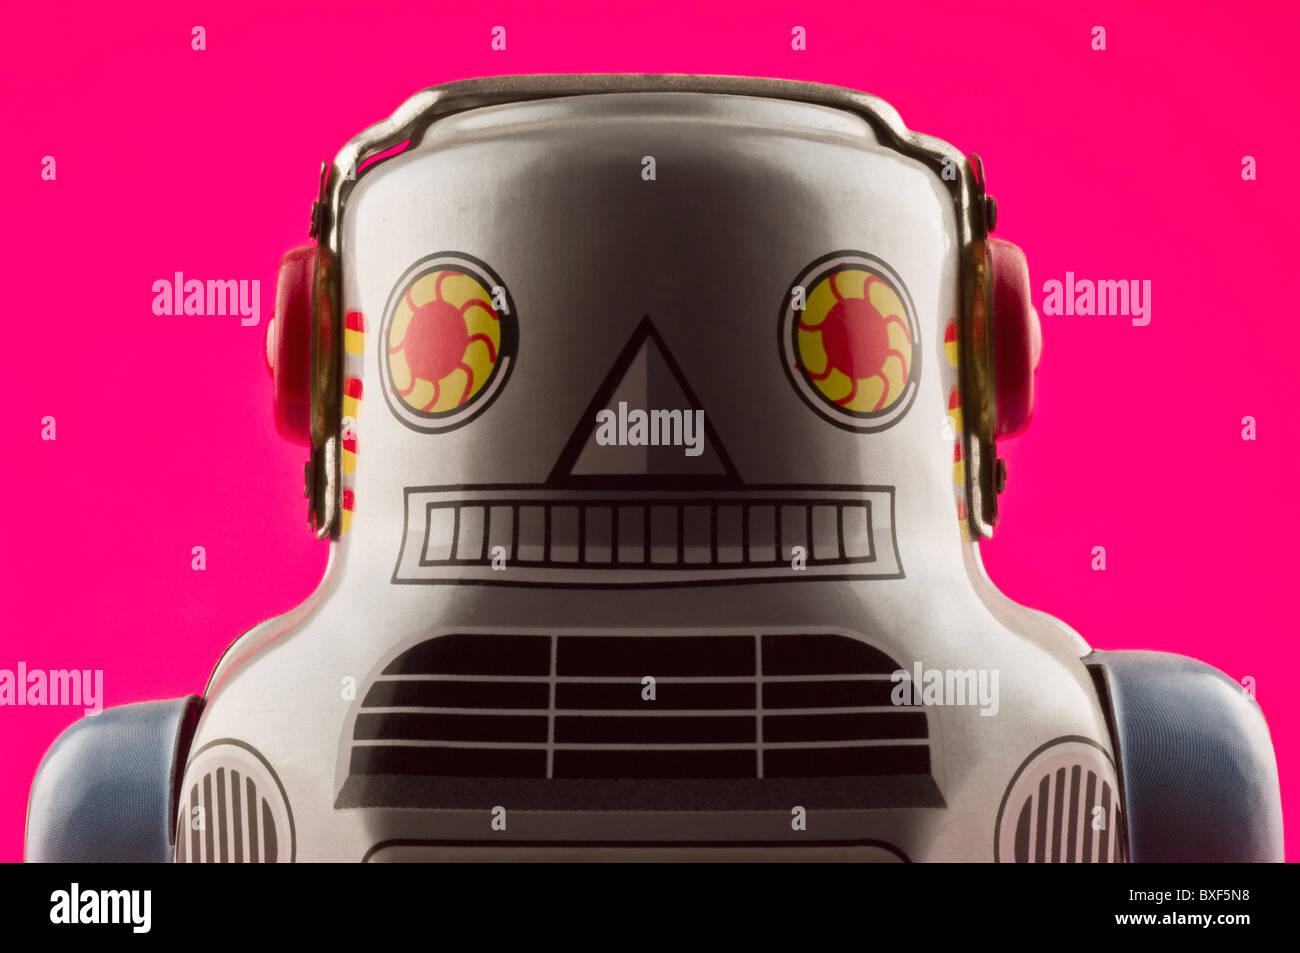 Robot de juguete Imagen De Stock